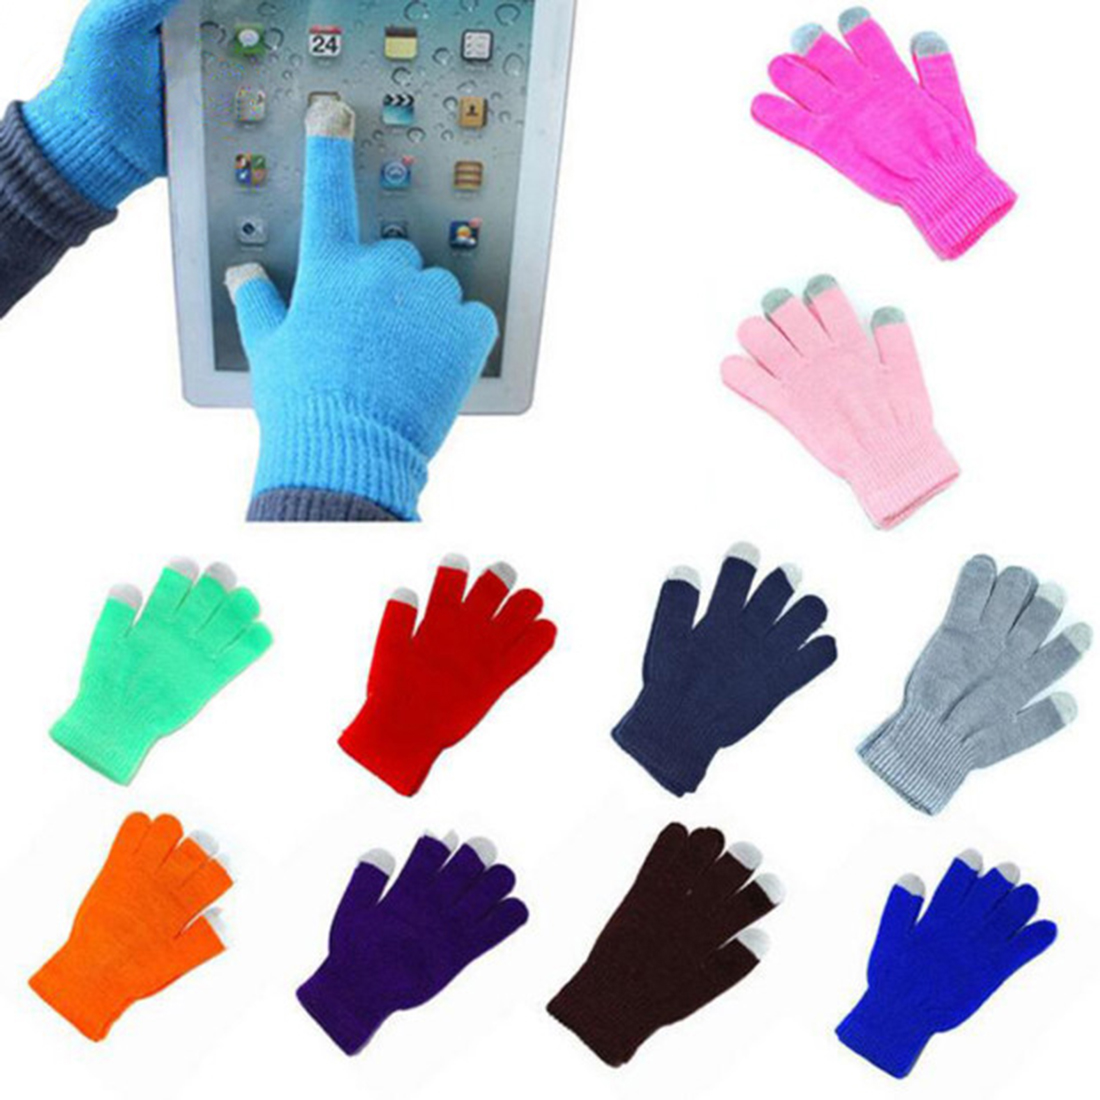 Winter Touch Screen Gloves Texting Cap Smart Phone Women Men Warm Stretch Knit Mittens Full Finger Female Crochet Soft Thicken